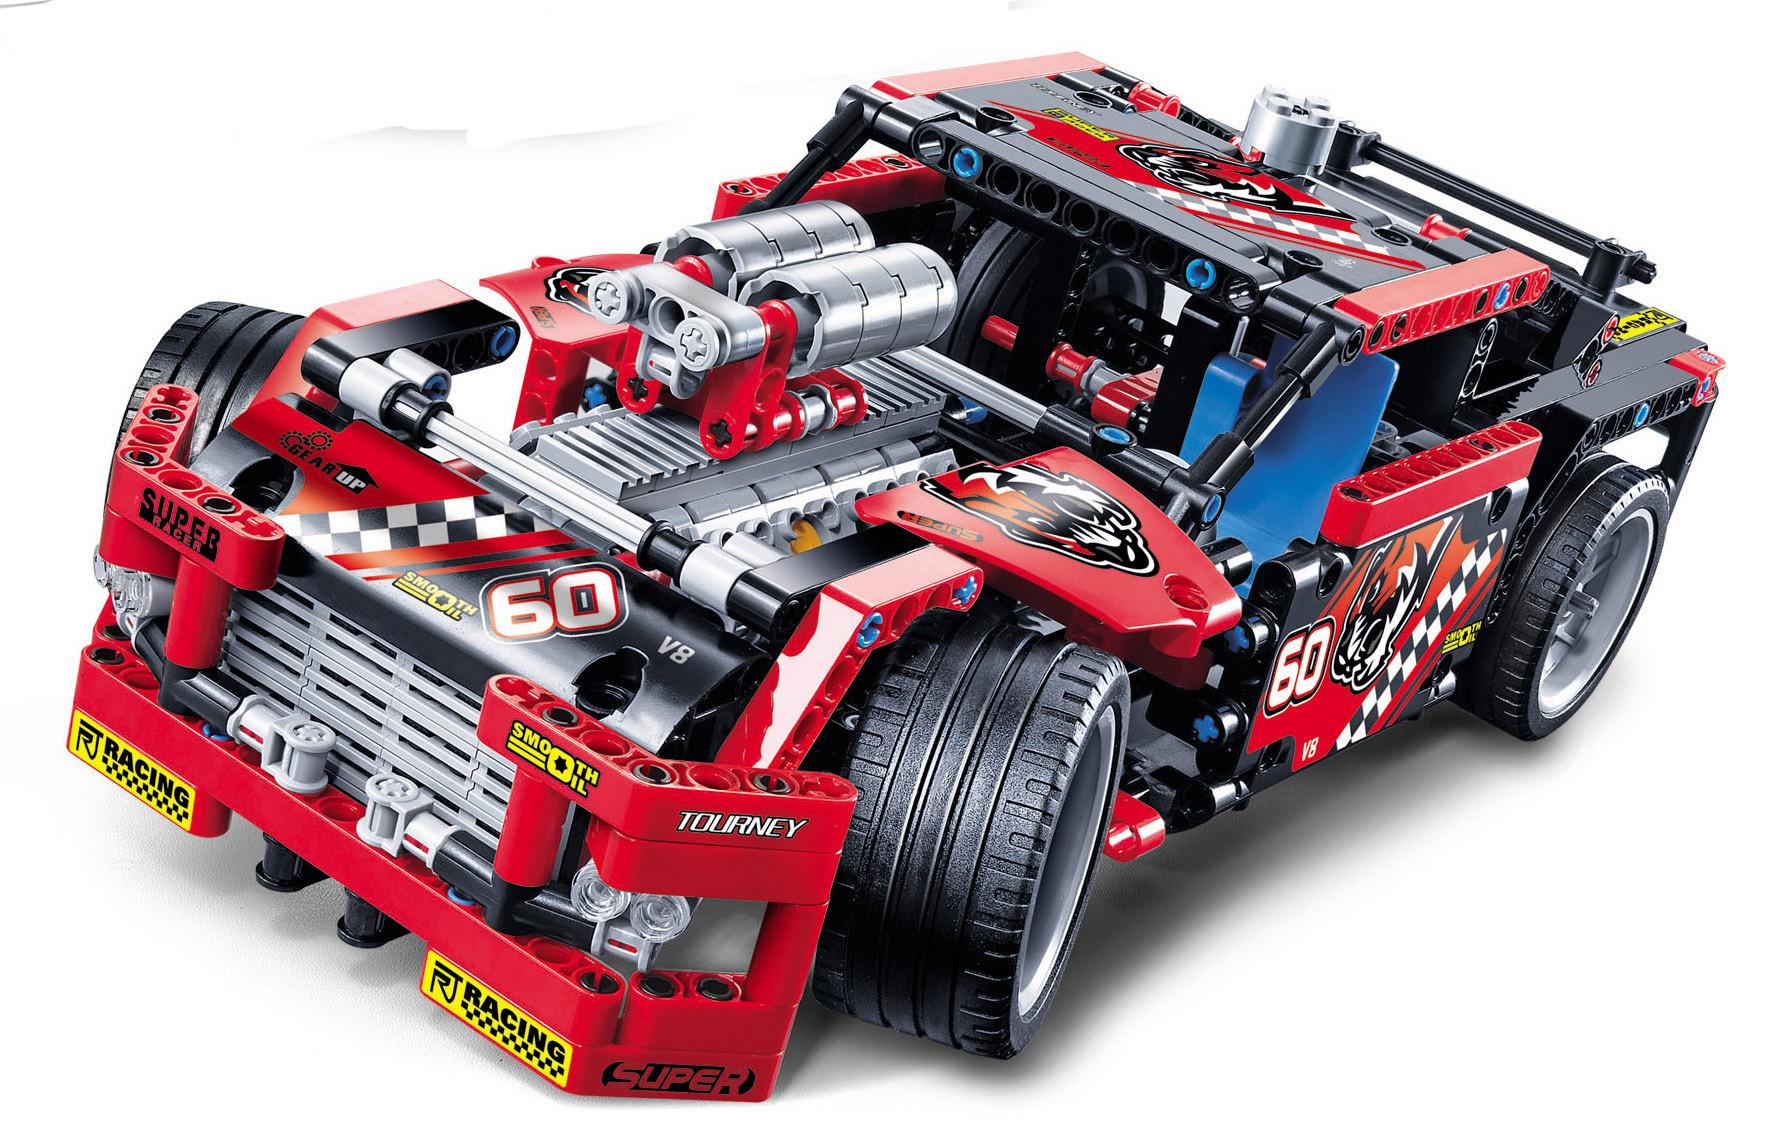 Decool 3360 Race Truck Car 2 In 1 Transformable Technic Building Block Sets